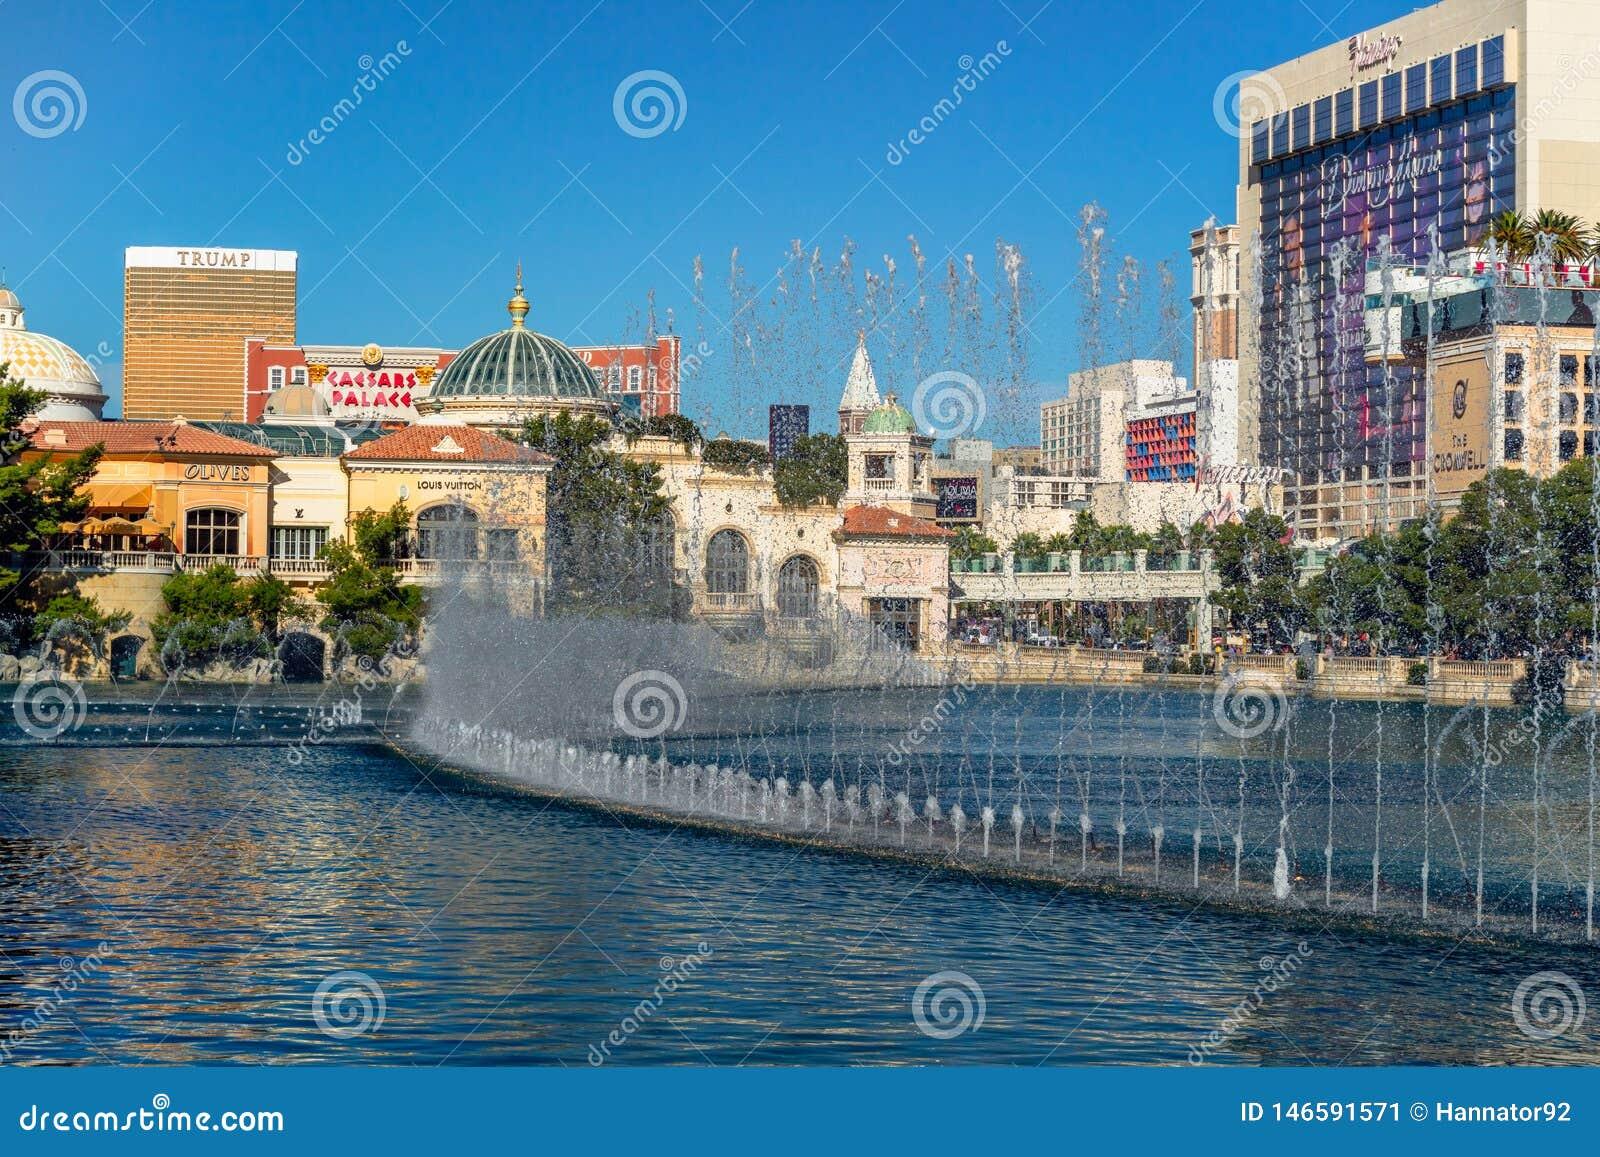 Las Vegas, Bellagio Fountain, Trump International Hotel, and Flamingo Hotel and Casino